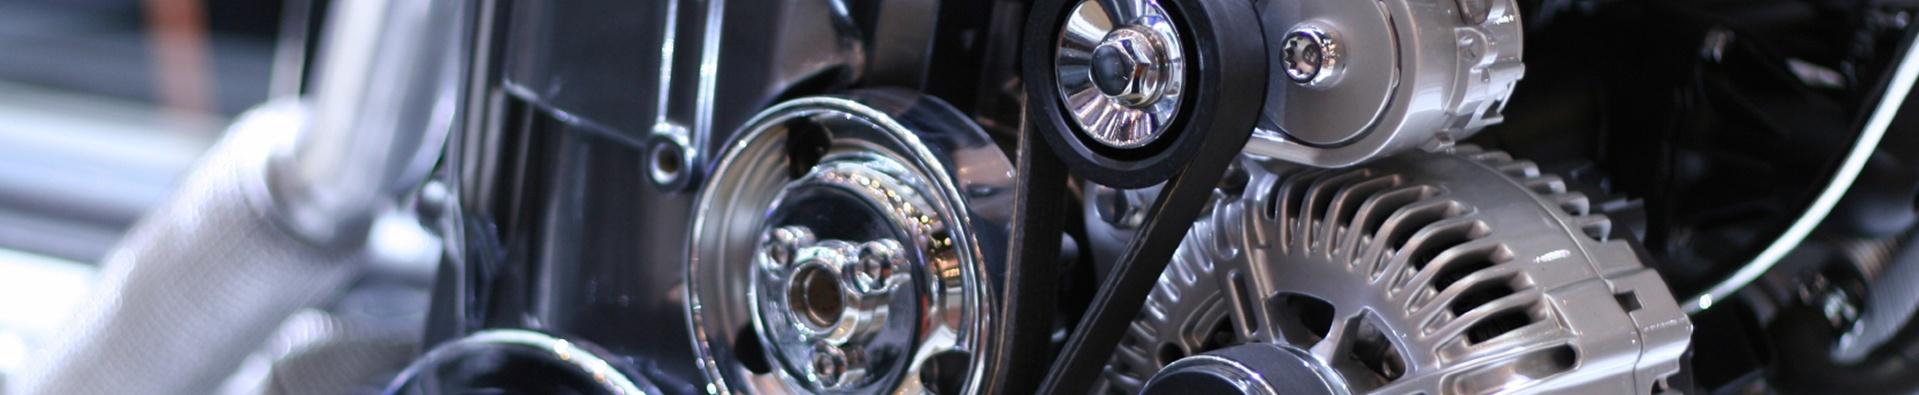 automotive.jpg